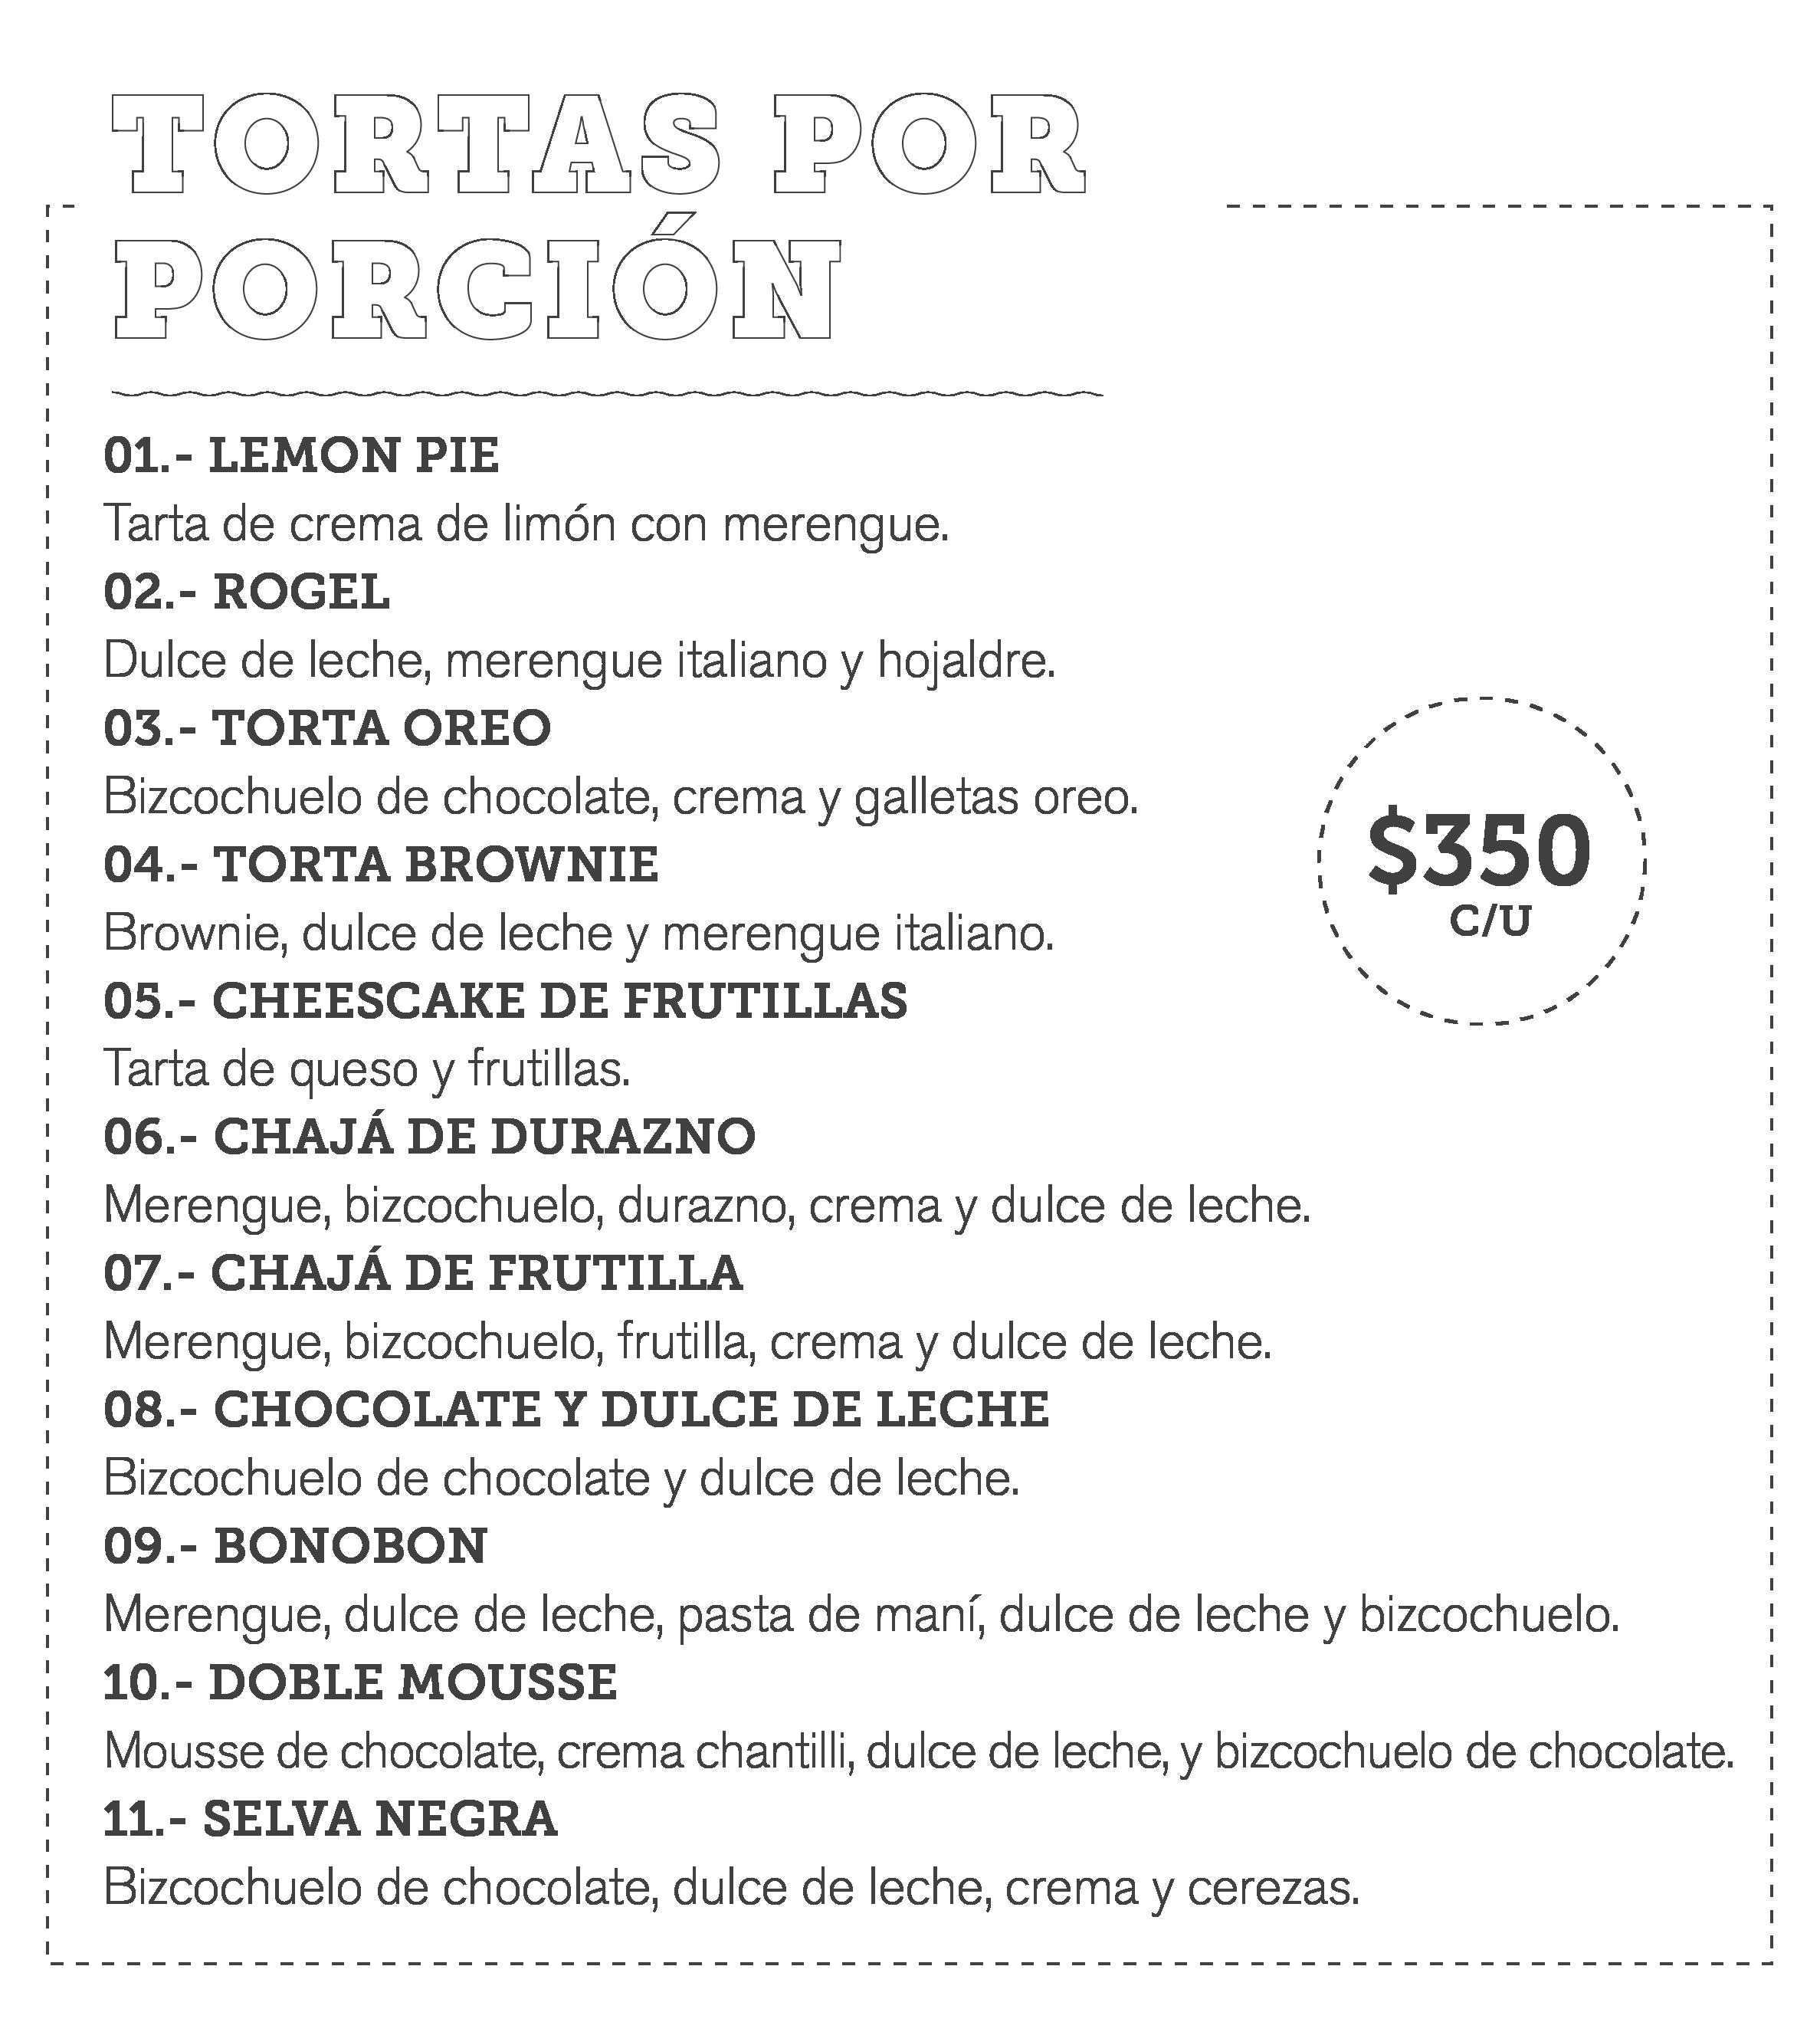 Menú Pastelería 2 | Tortas: Bonobon, Chajá, Selva Negra, Torta Oreo